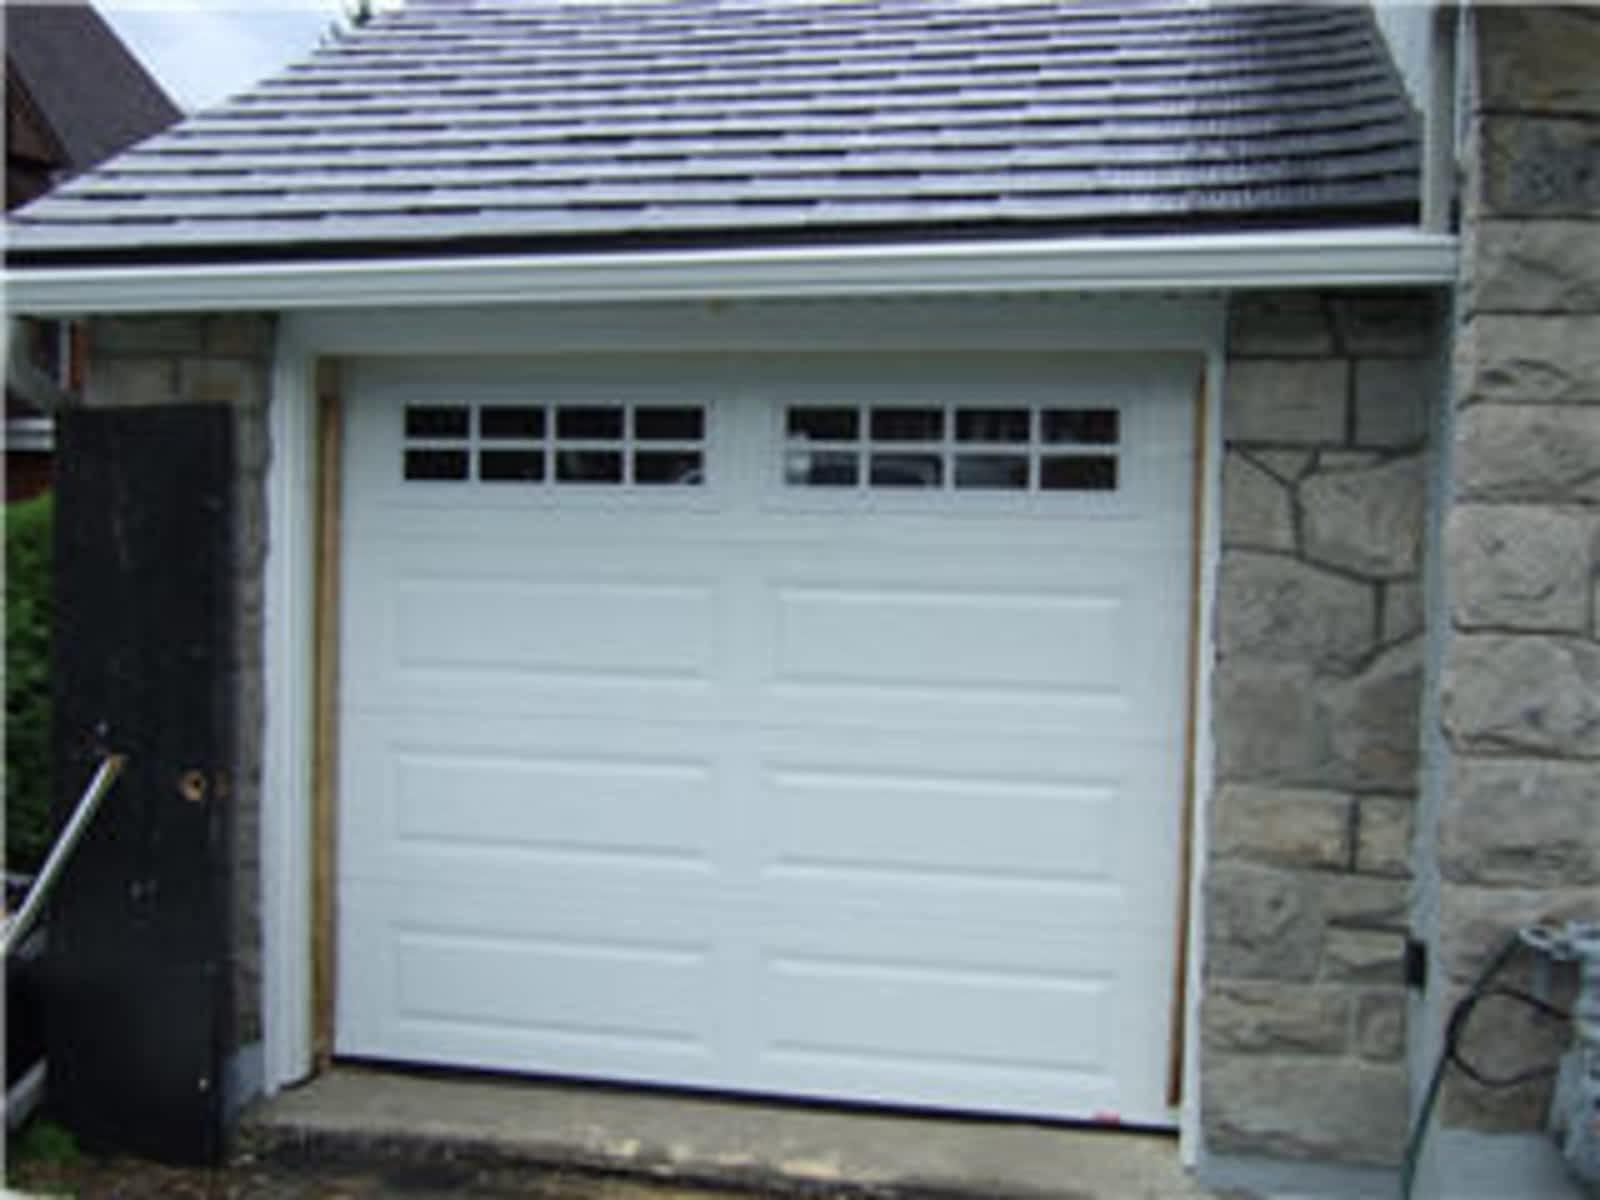 Dr garage doors image collections doors design ideas dr garage doors choice image doors design ideas & Garage Door Ottawa Choice Image - Doors Design Ideas pezcame.com